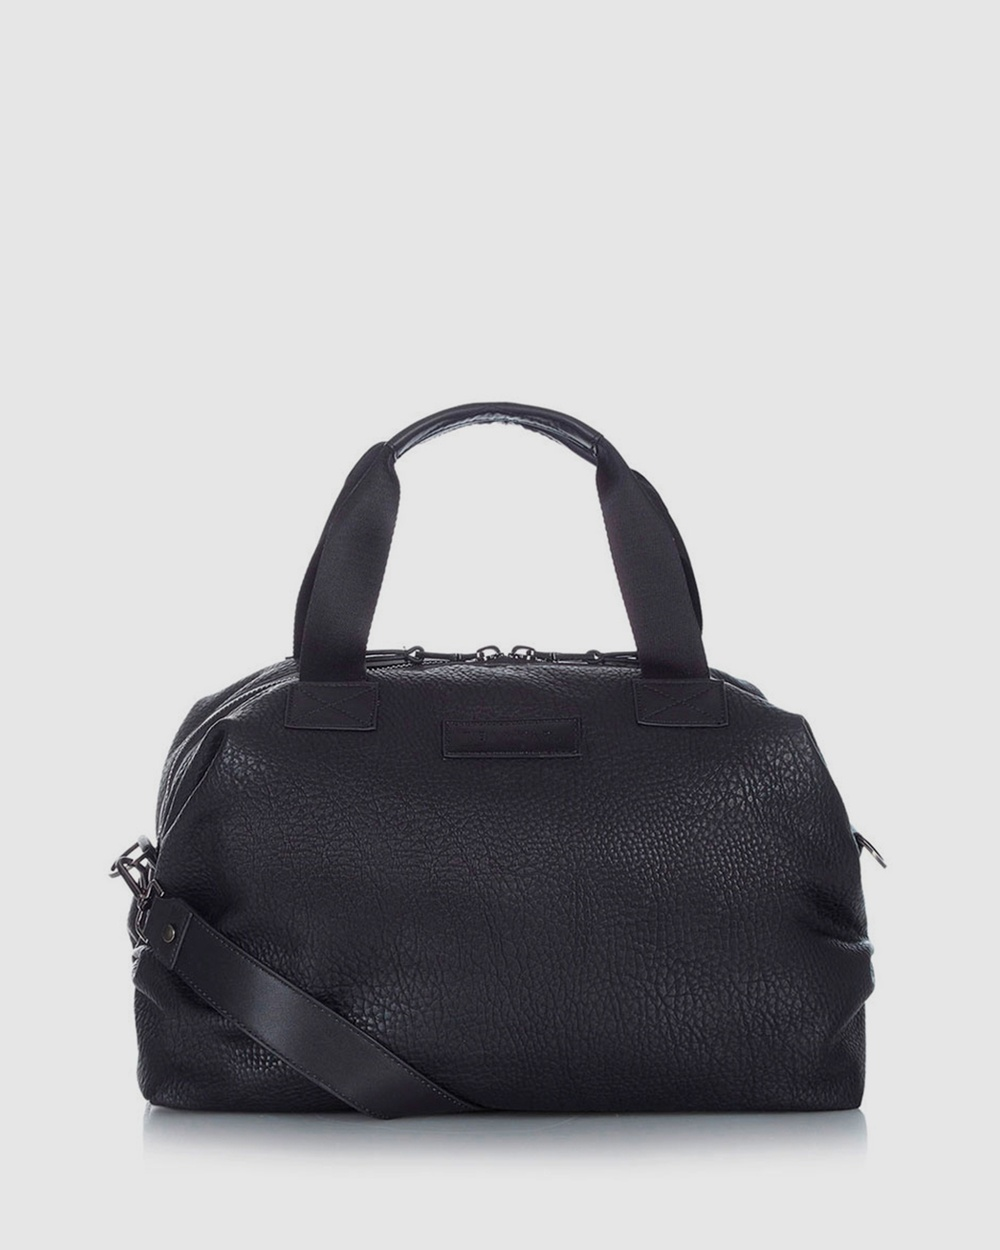 TIBA + MARL Raf Holdall Changing Bag Duffle Bags Black